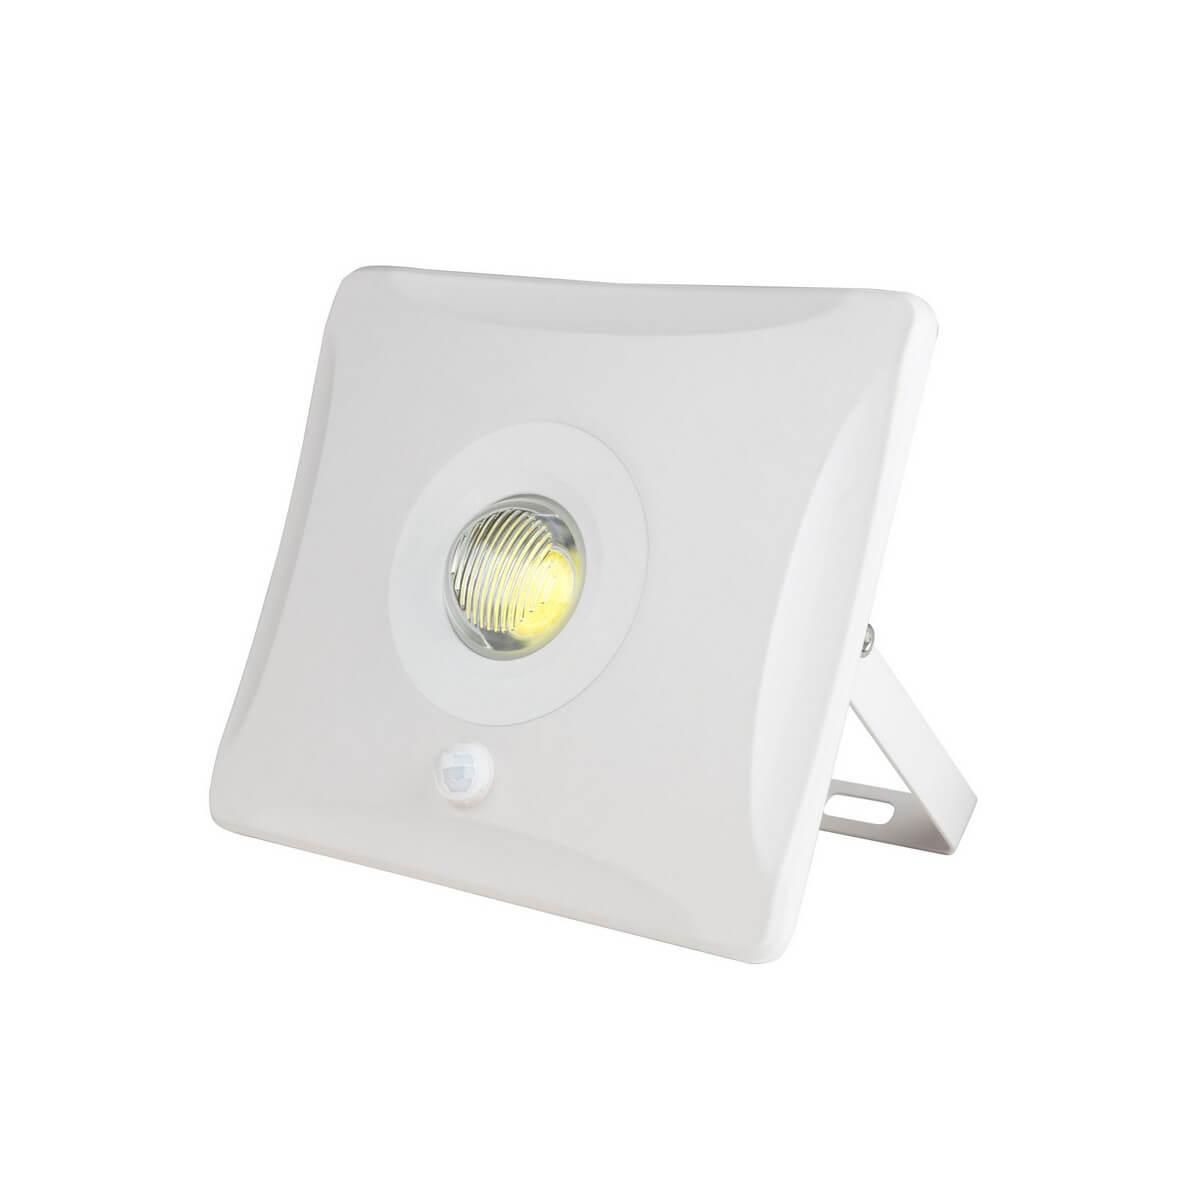 Прожектор светодиодный (UL-00000781) Uniel 10W 6000K ULF-F31-10W/DW Sensor IP65 100-265В White 7022 diy 10w 1050lm 6000k cob led white light rectangle strip yellow dc 12 14v